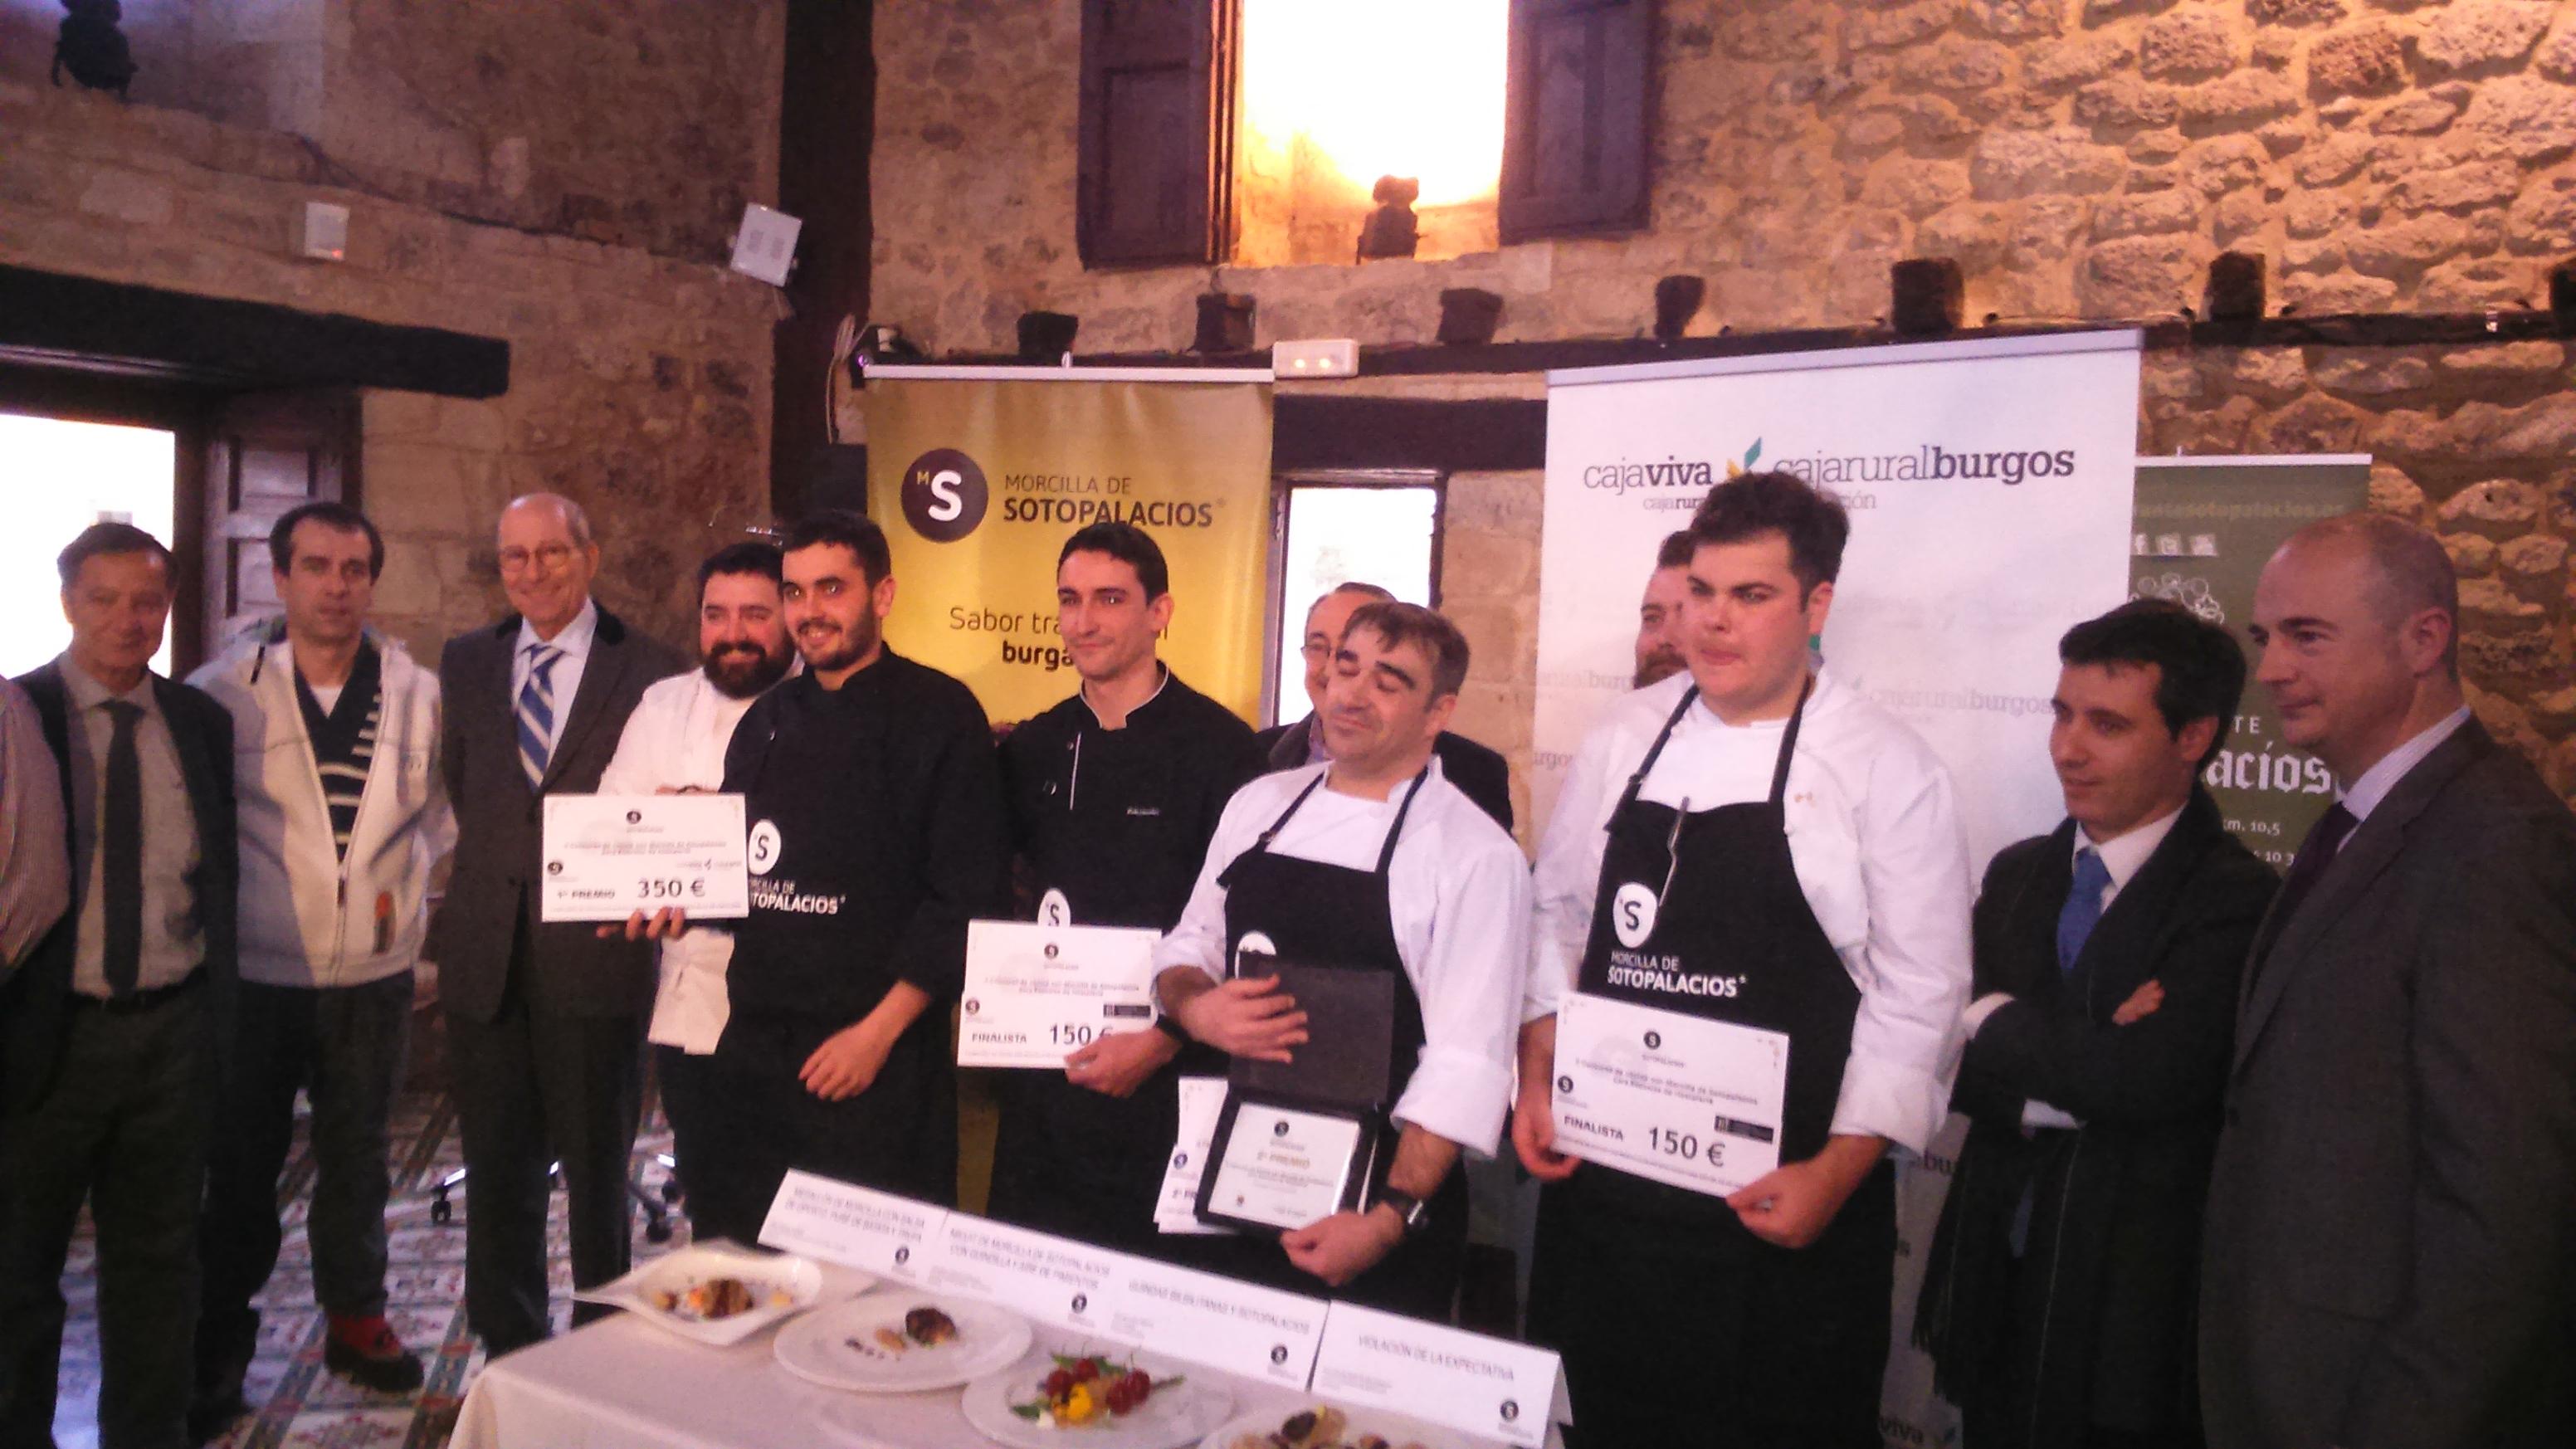 II concurso cocina con morcilla de Sotopalacios